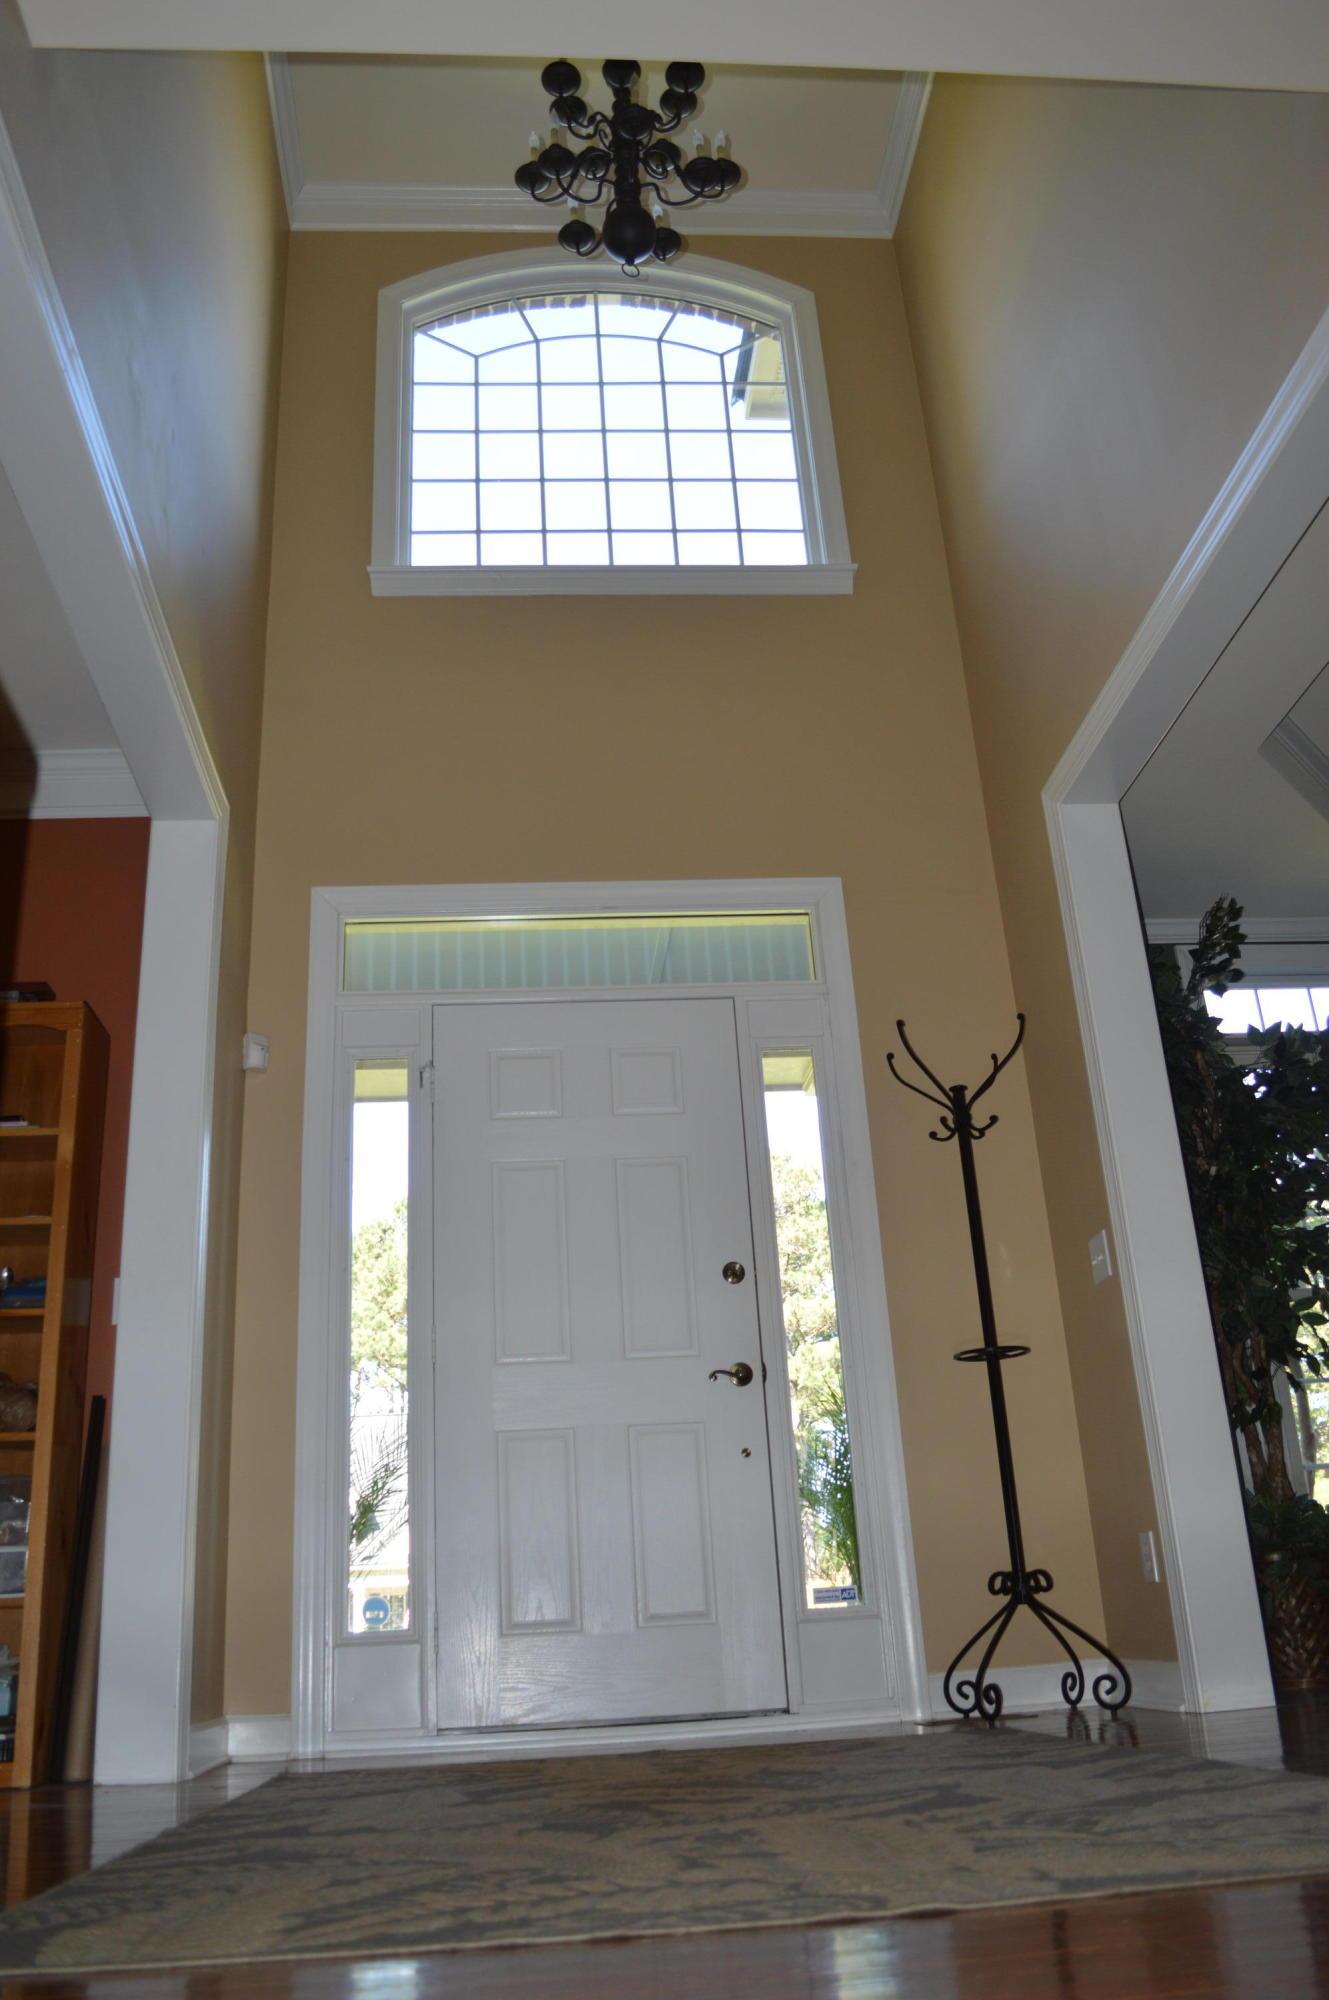 Dunes West Homes For Sale - 1345 White Deer, Mount Pleasant, SC - 22